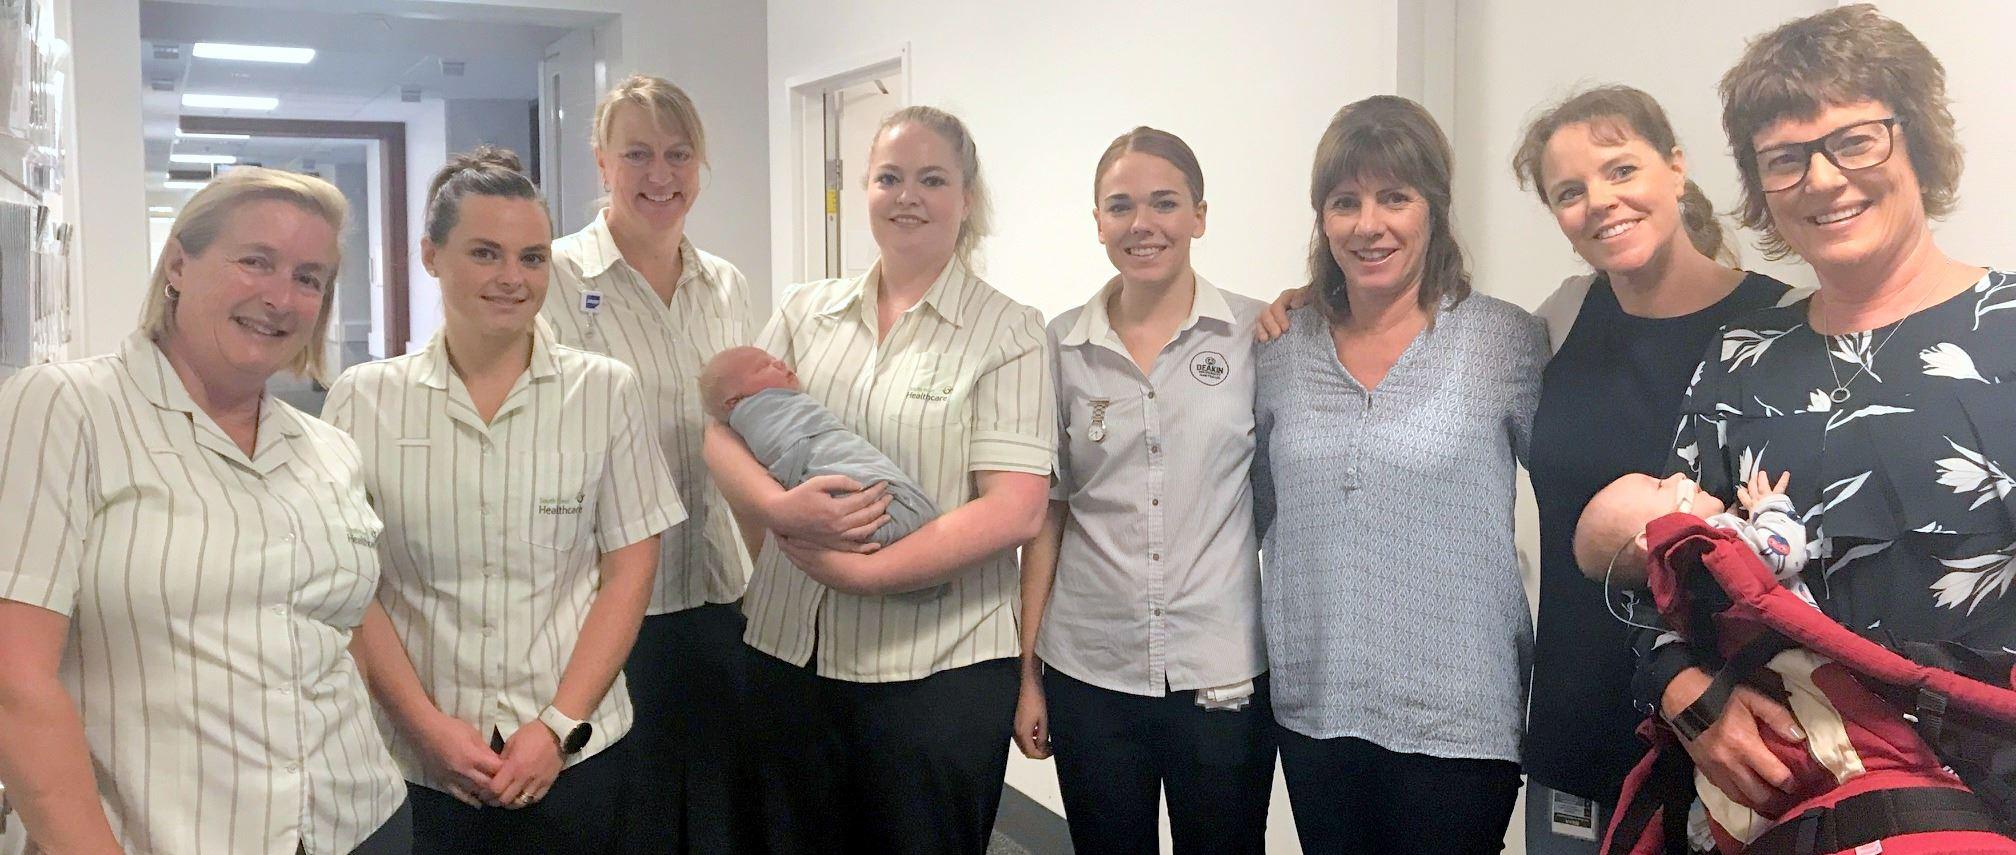 SWH Midwifery Staff